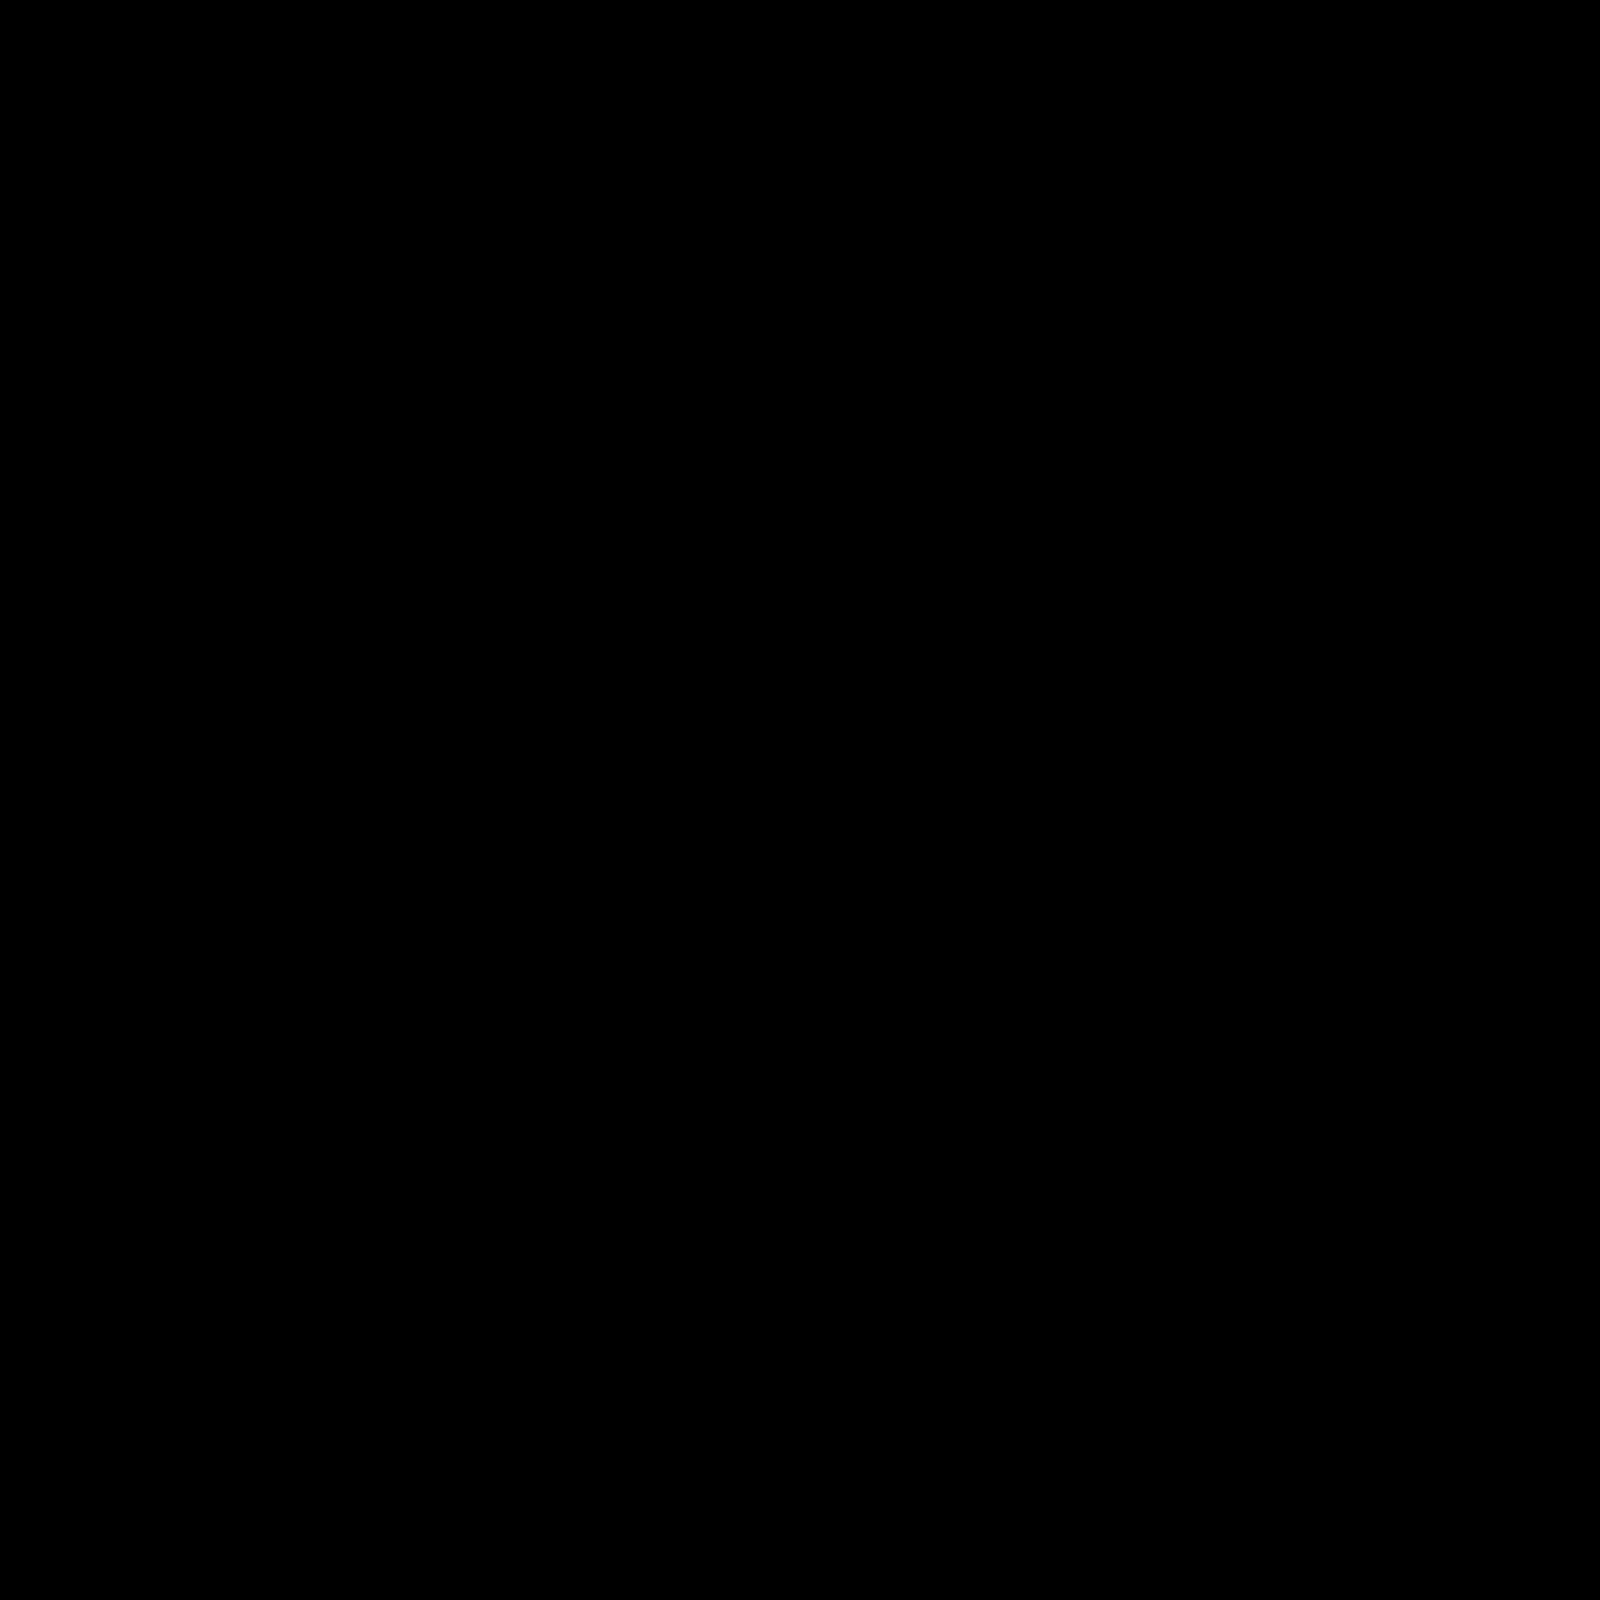 Hanukkah Glass icon